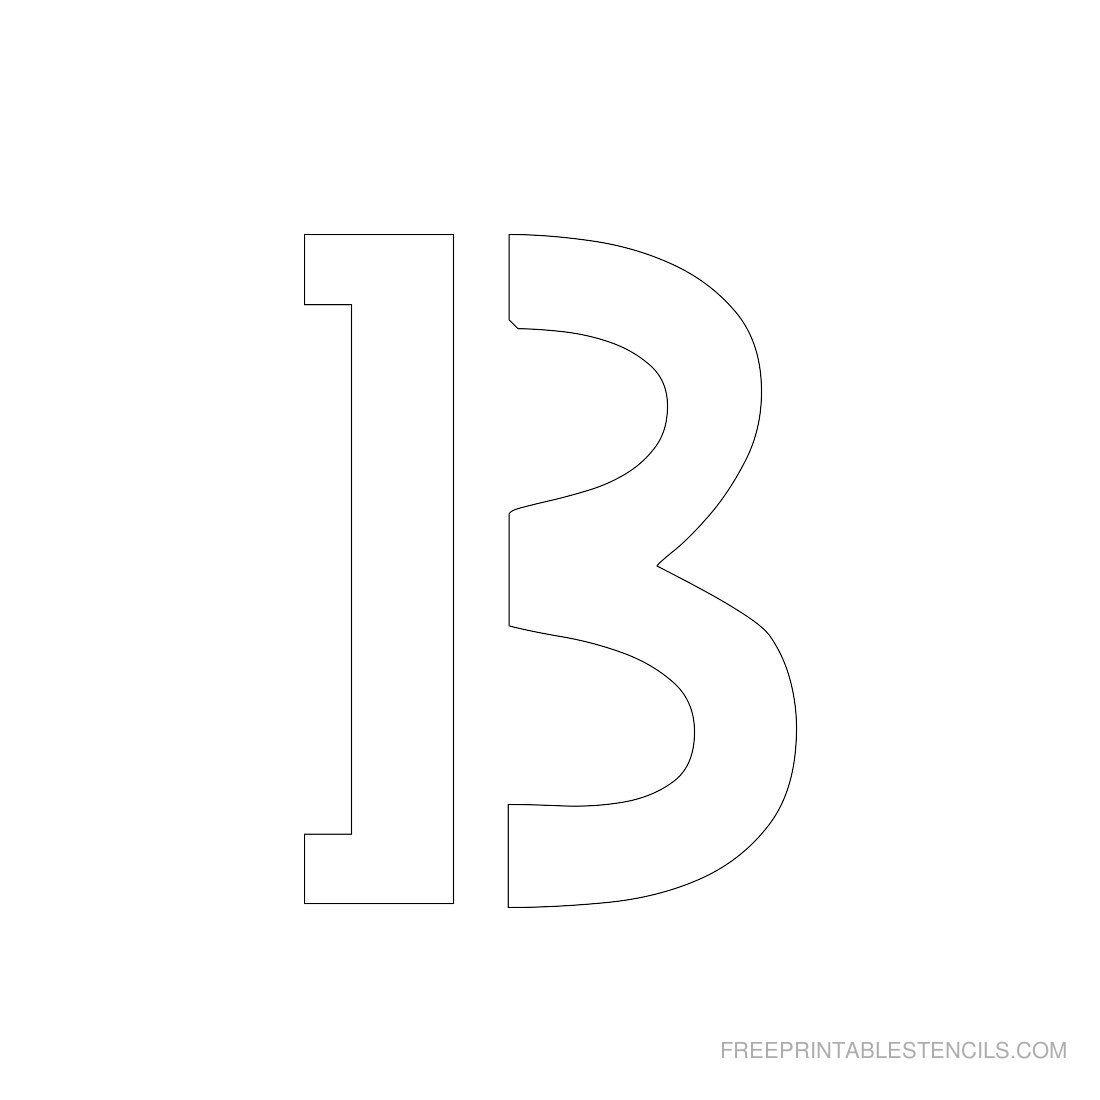 Printable 3 Inch Letter Stencils | Scrapbooking | Letter Stencils To - Free Printable 3 Inch Number Stencils